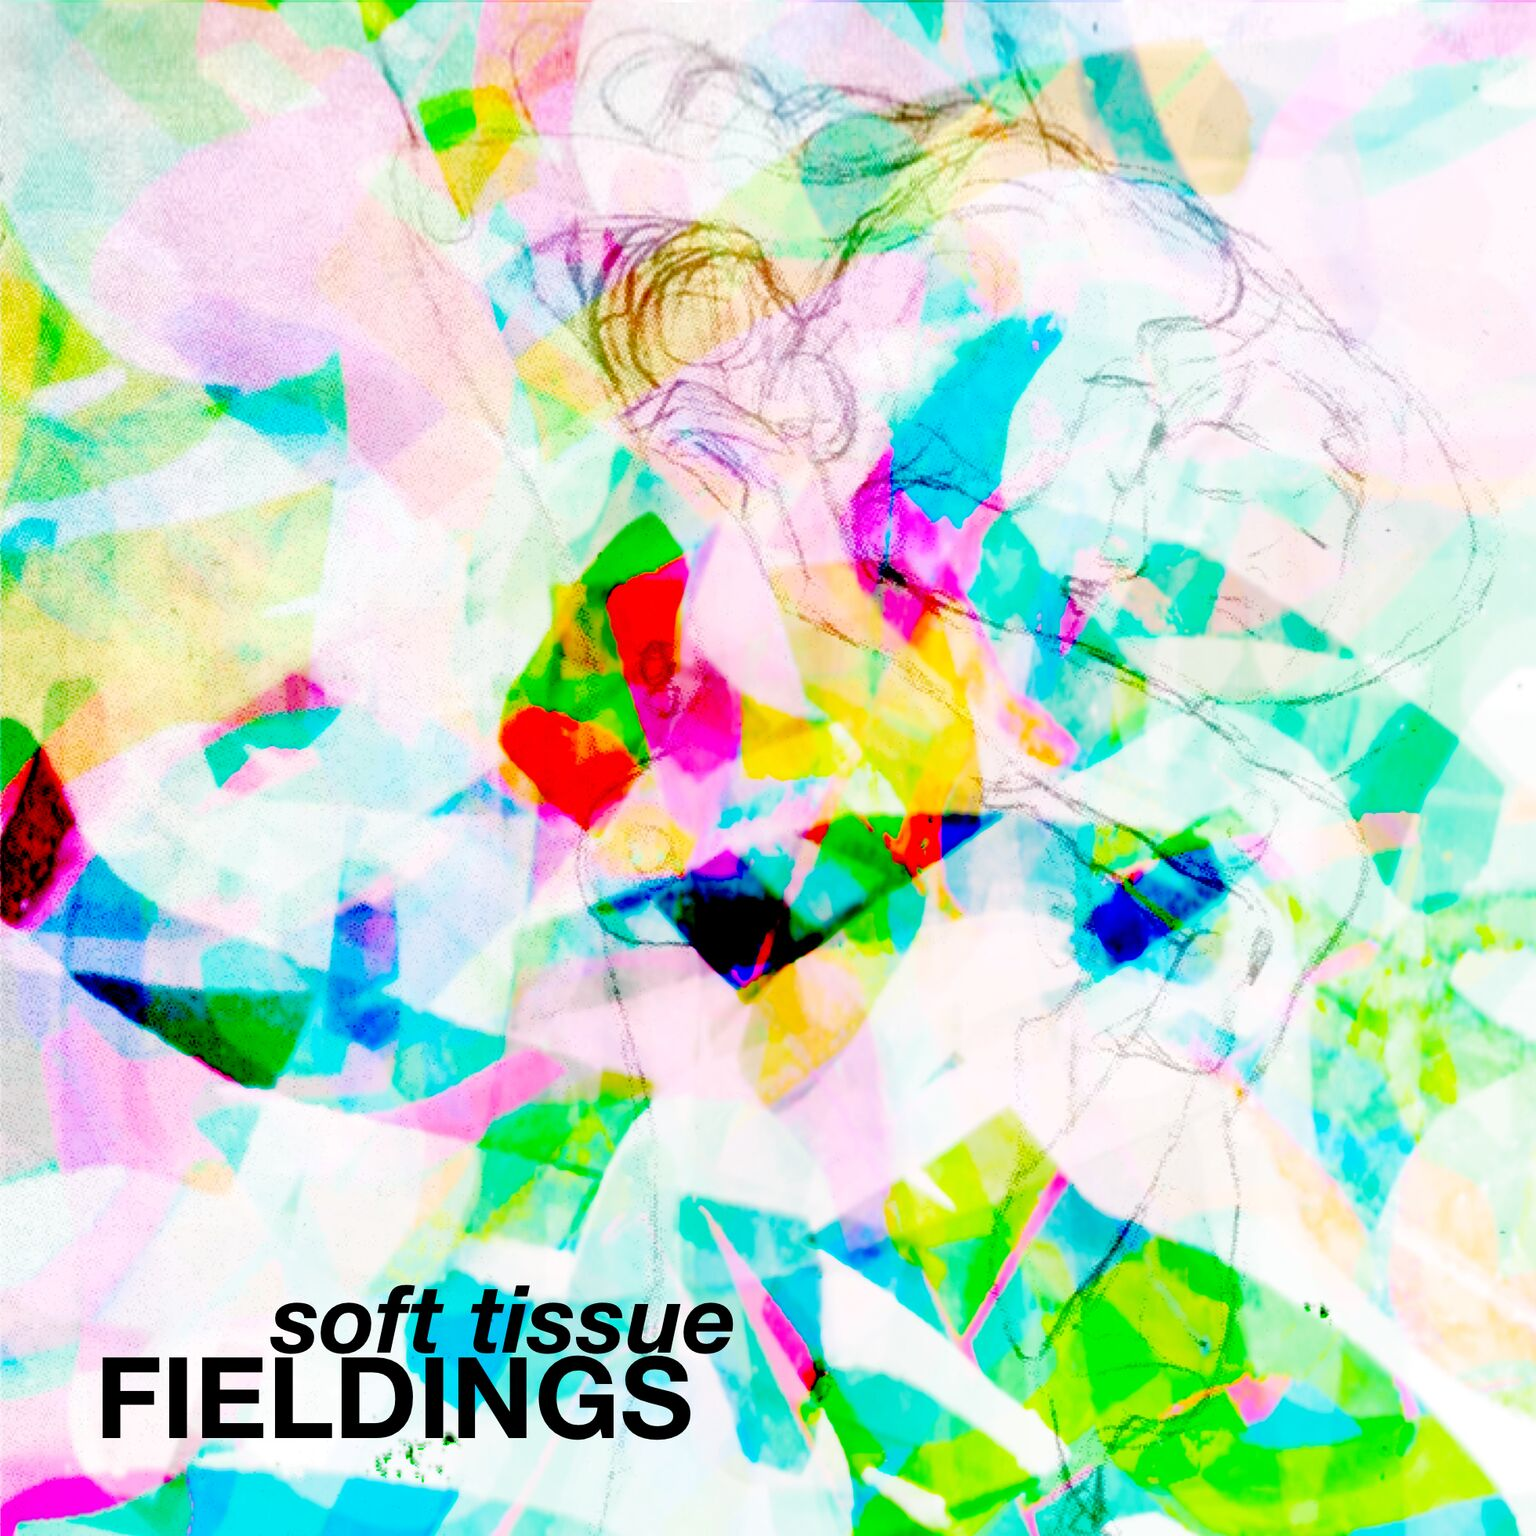 Fieldings - Soft Tissue Art.jpg